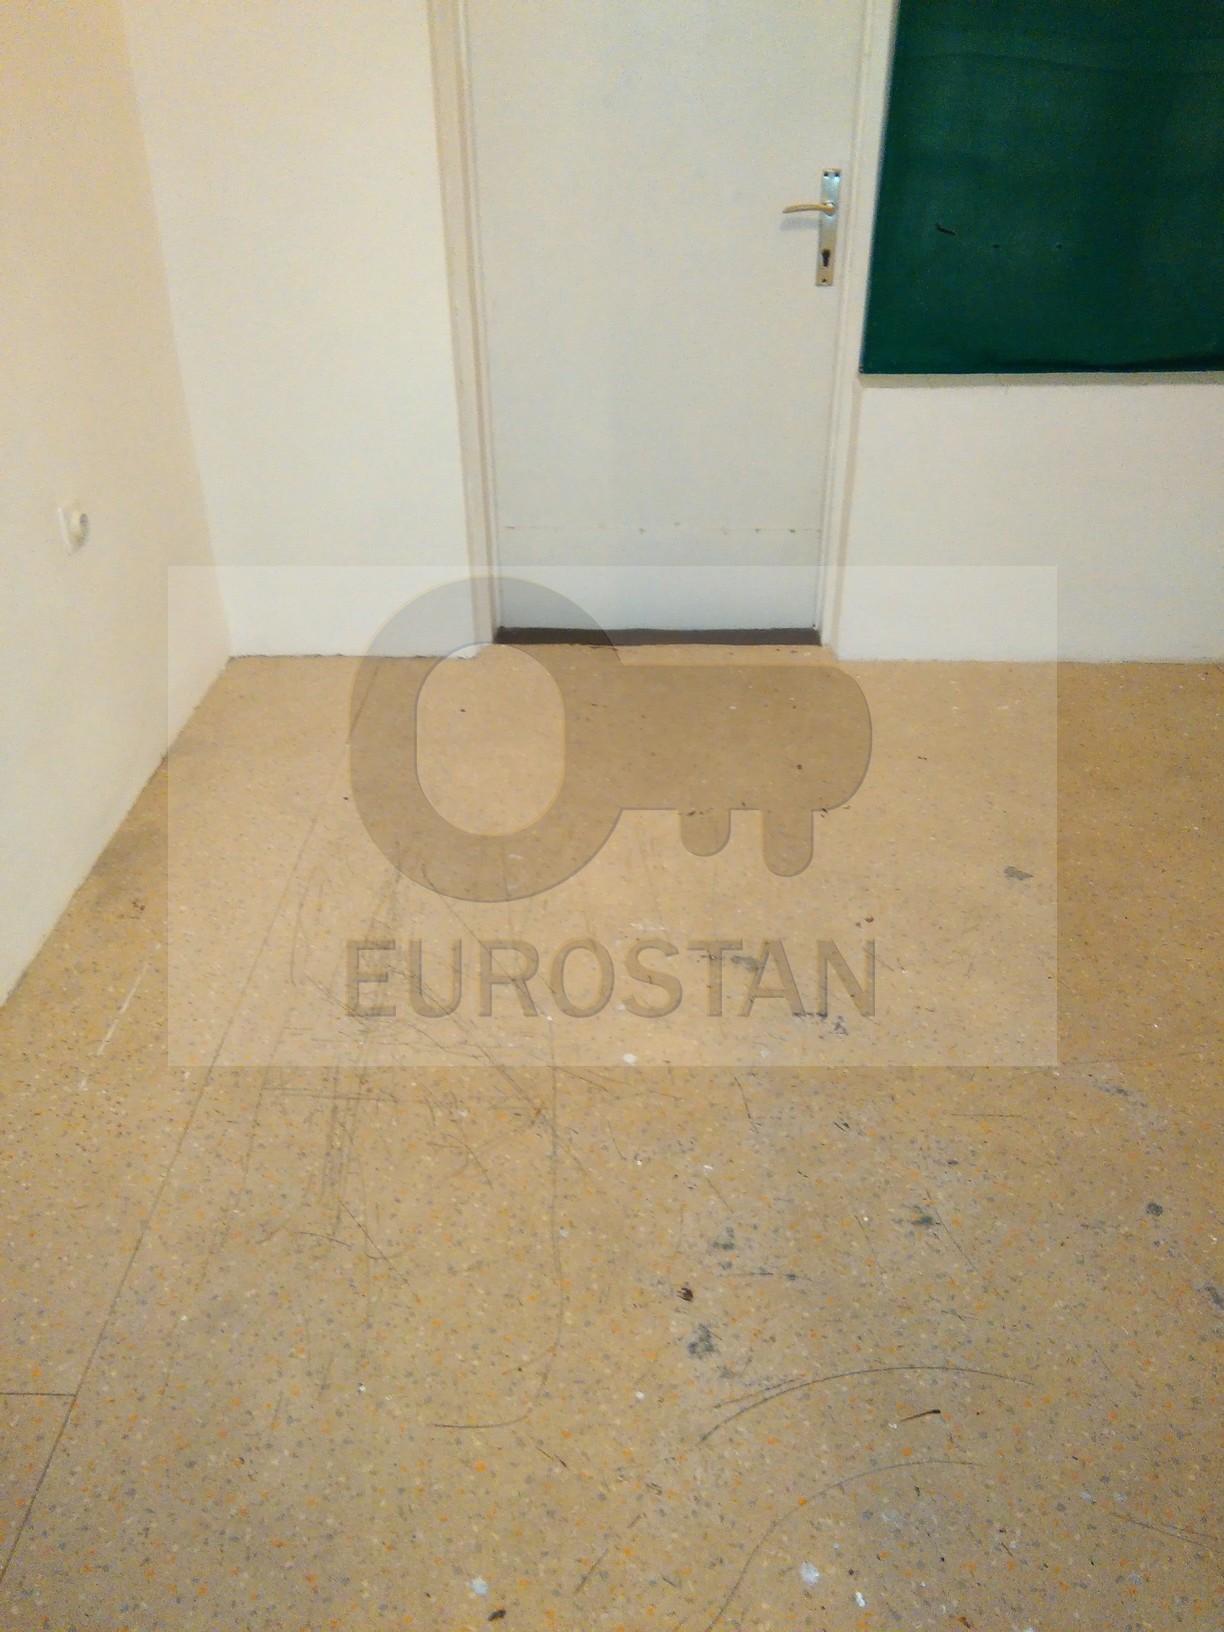 Poslovni prostor LIPOV LAD 150 EUR